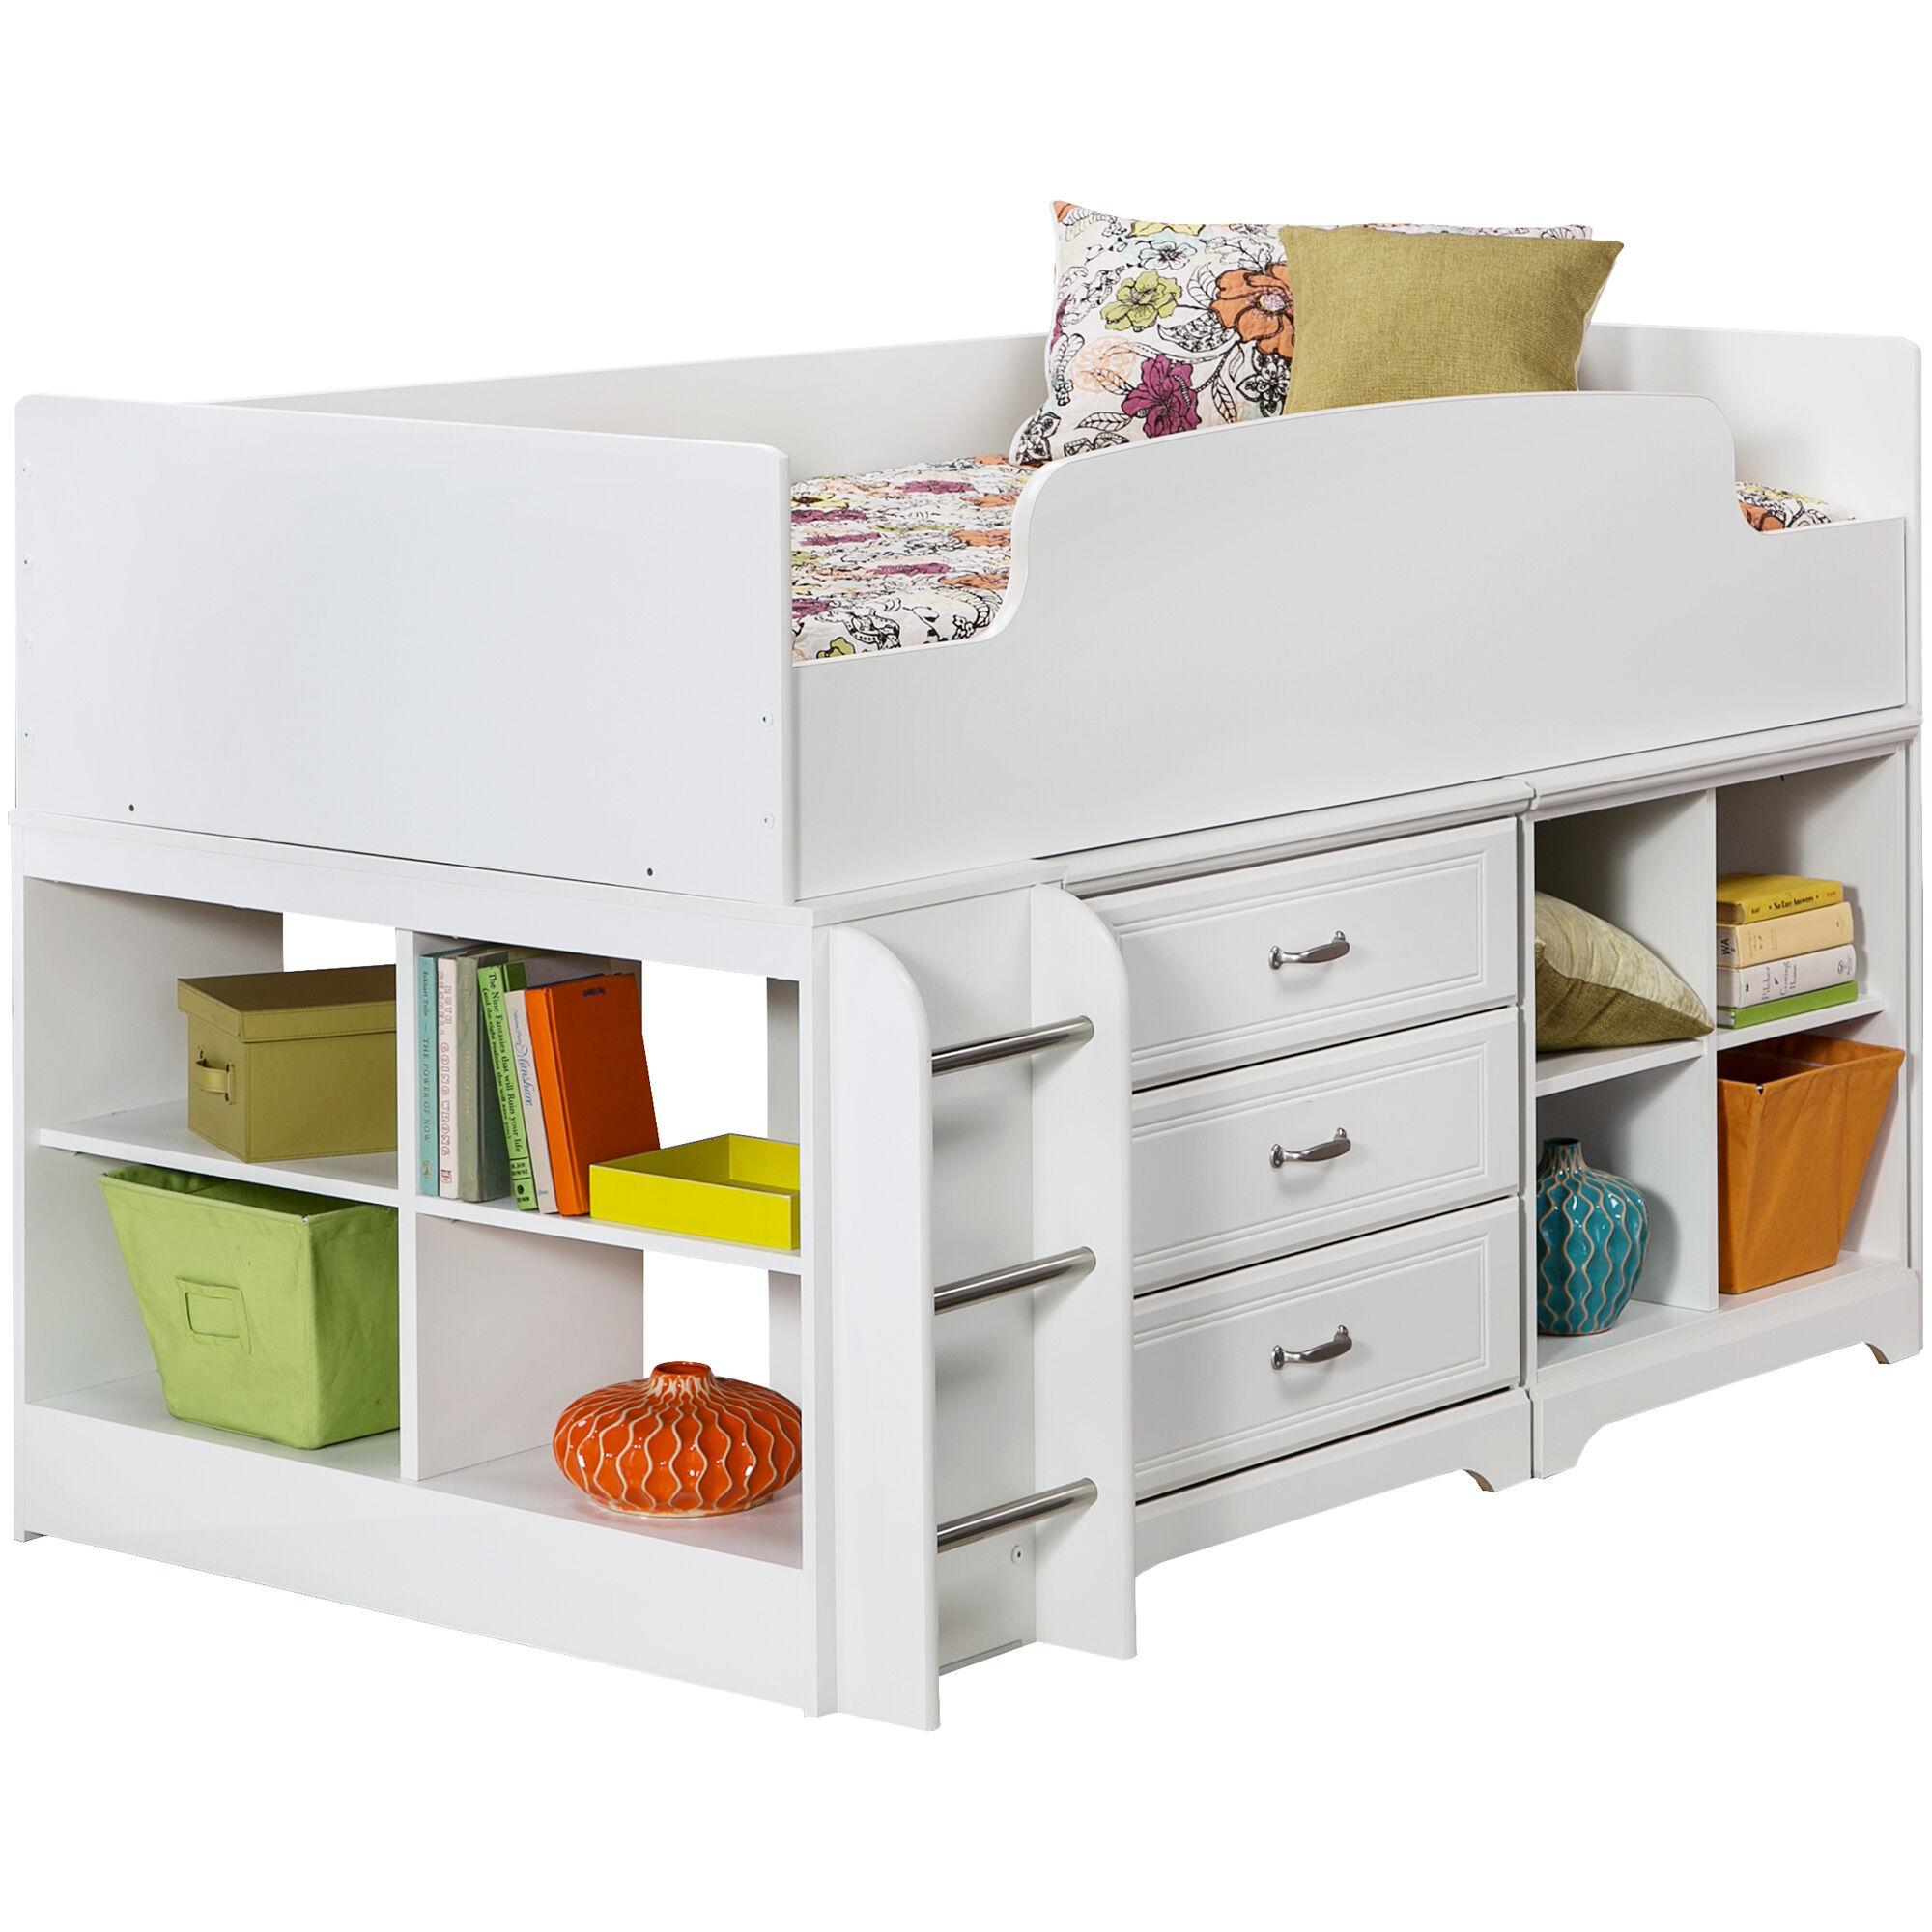 Lulu Storage Loft Bed; Lulu Storage Loft Bed ...